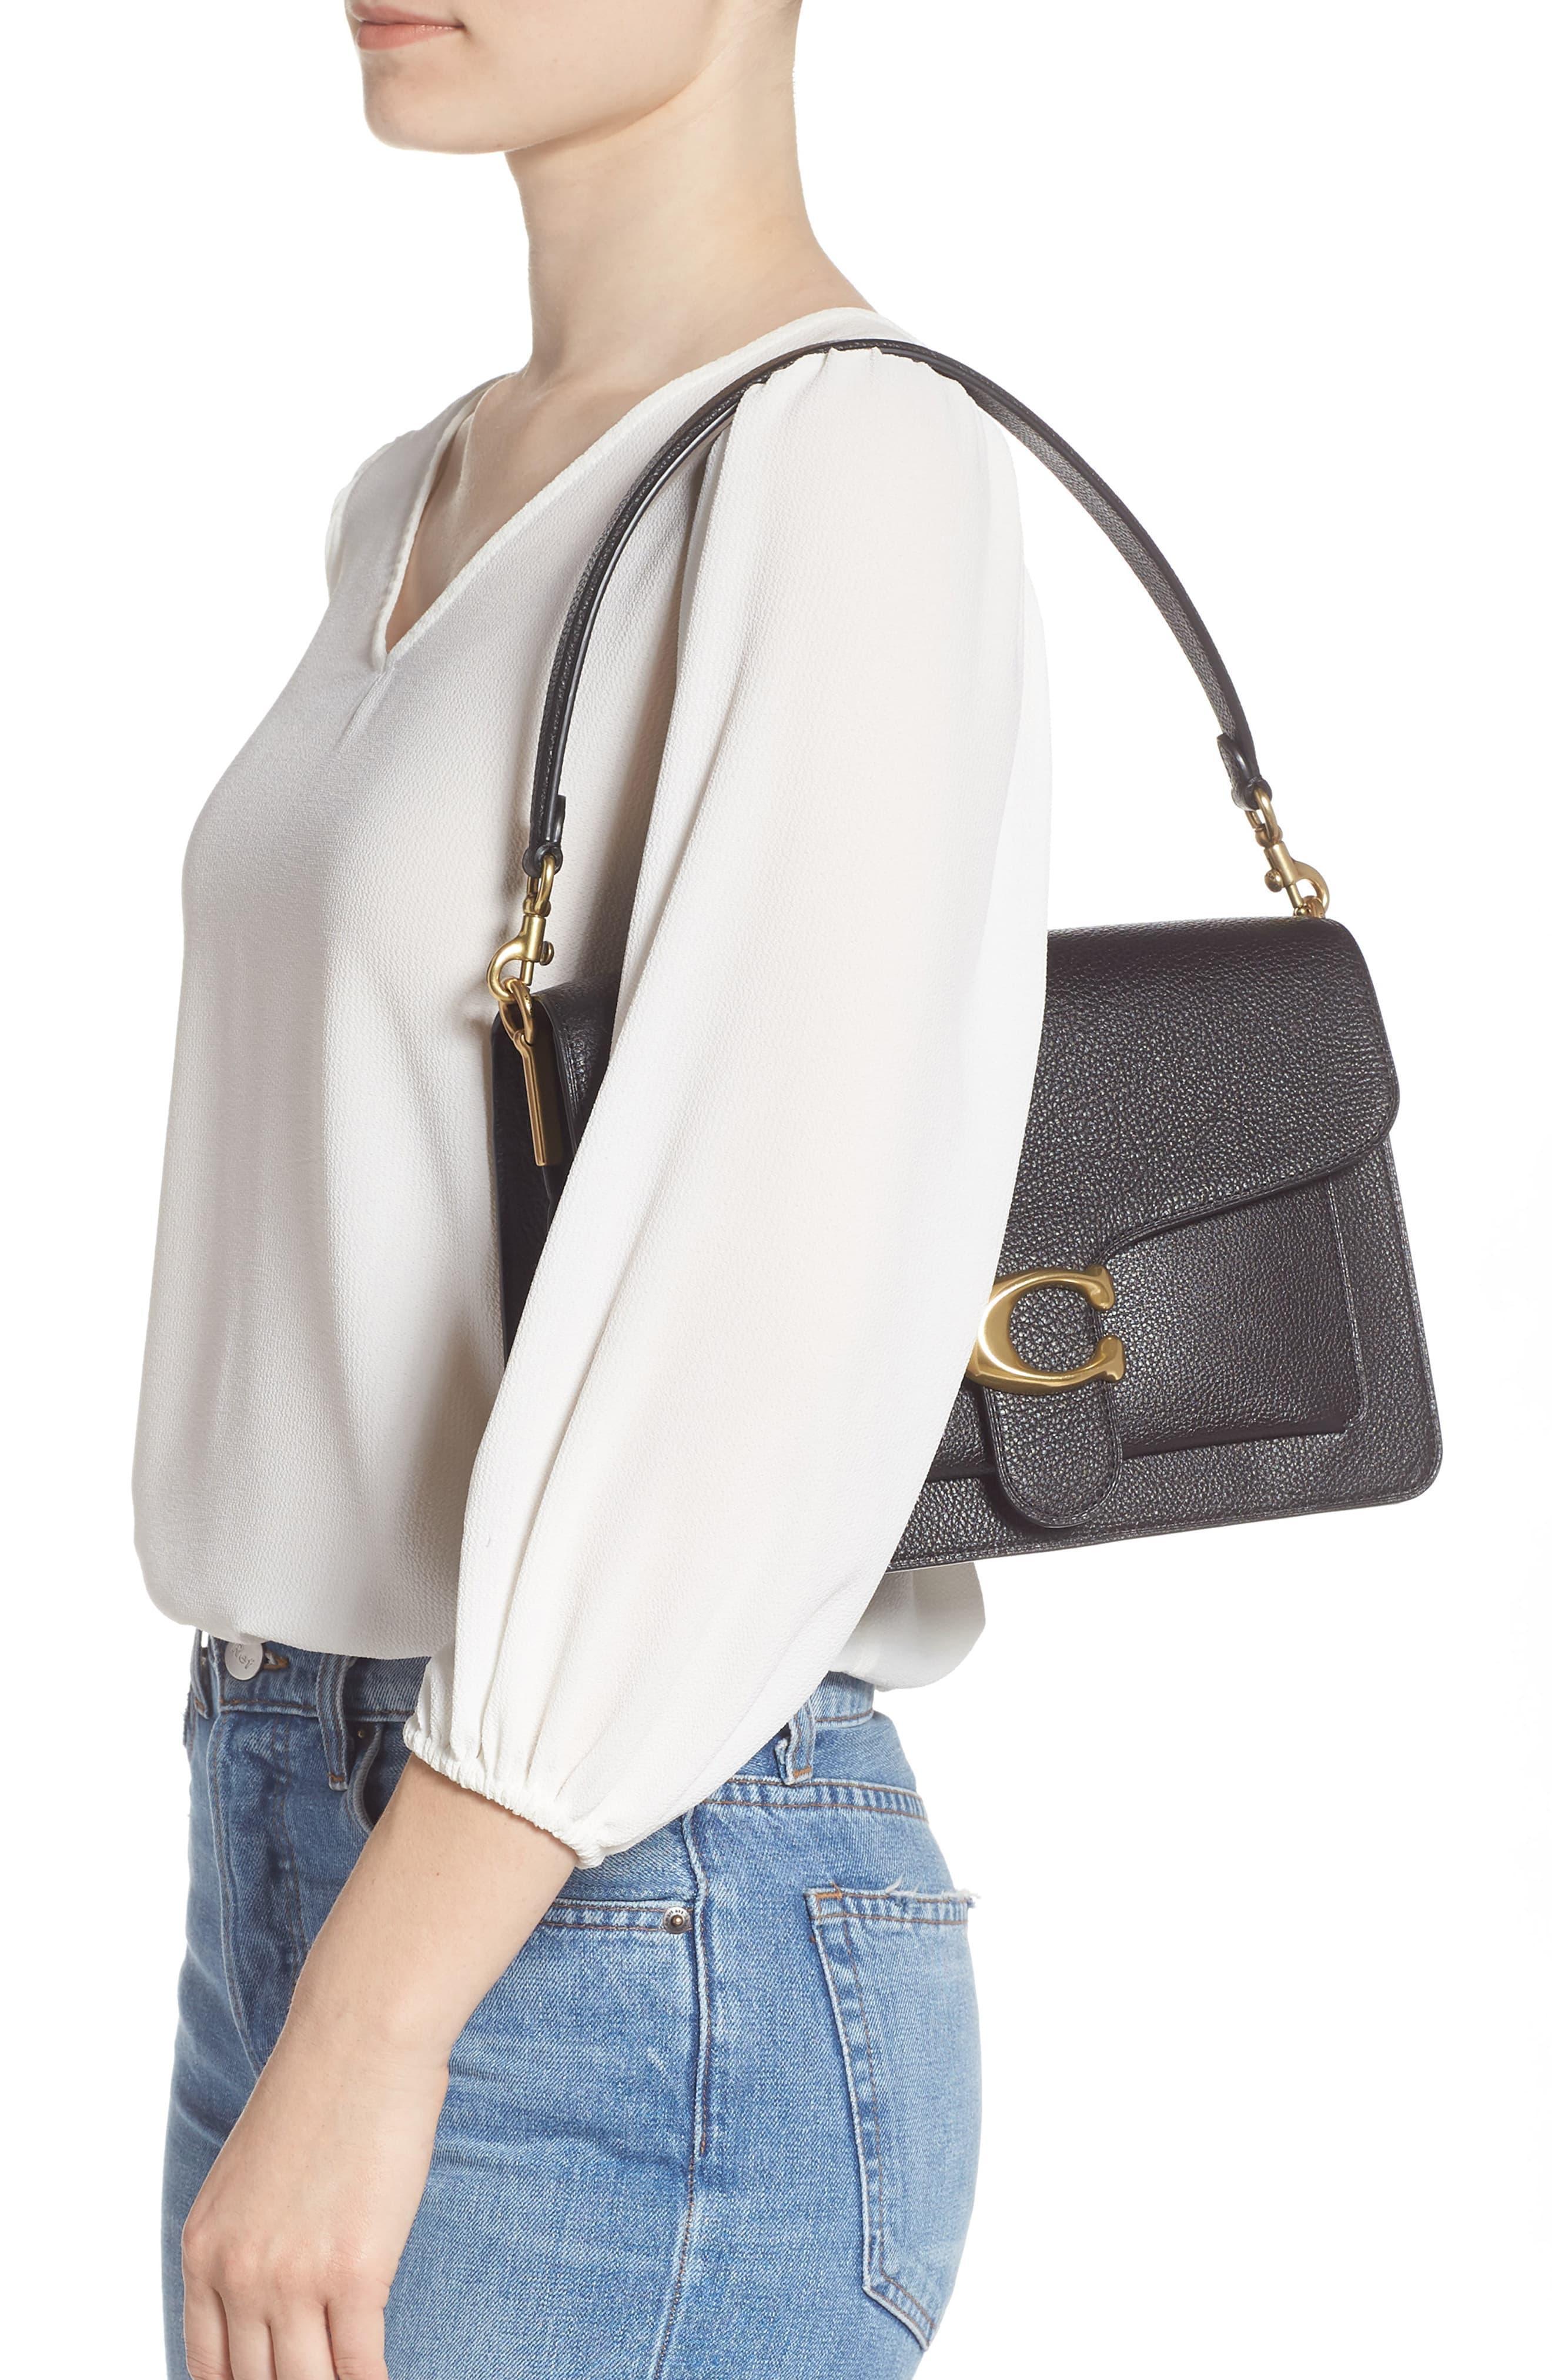 a4f3dbfc118 Women's Black Tabby Leather Shoulder Bag